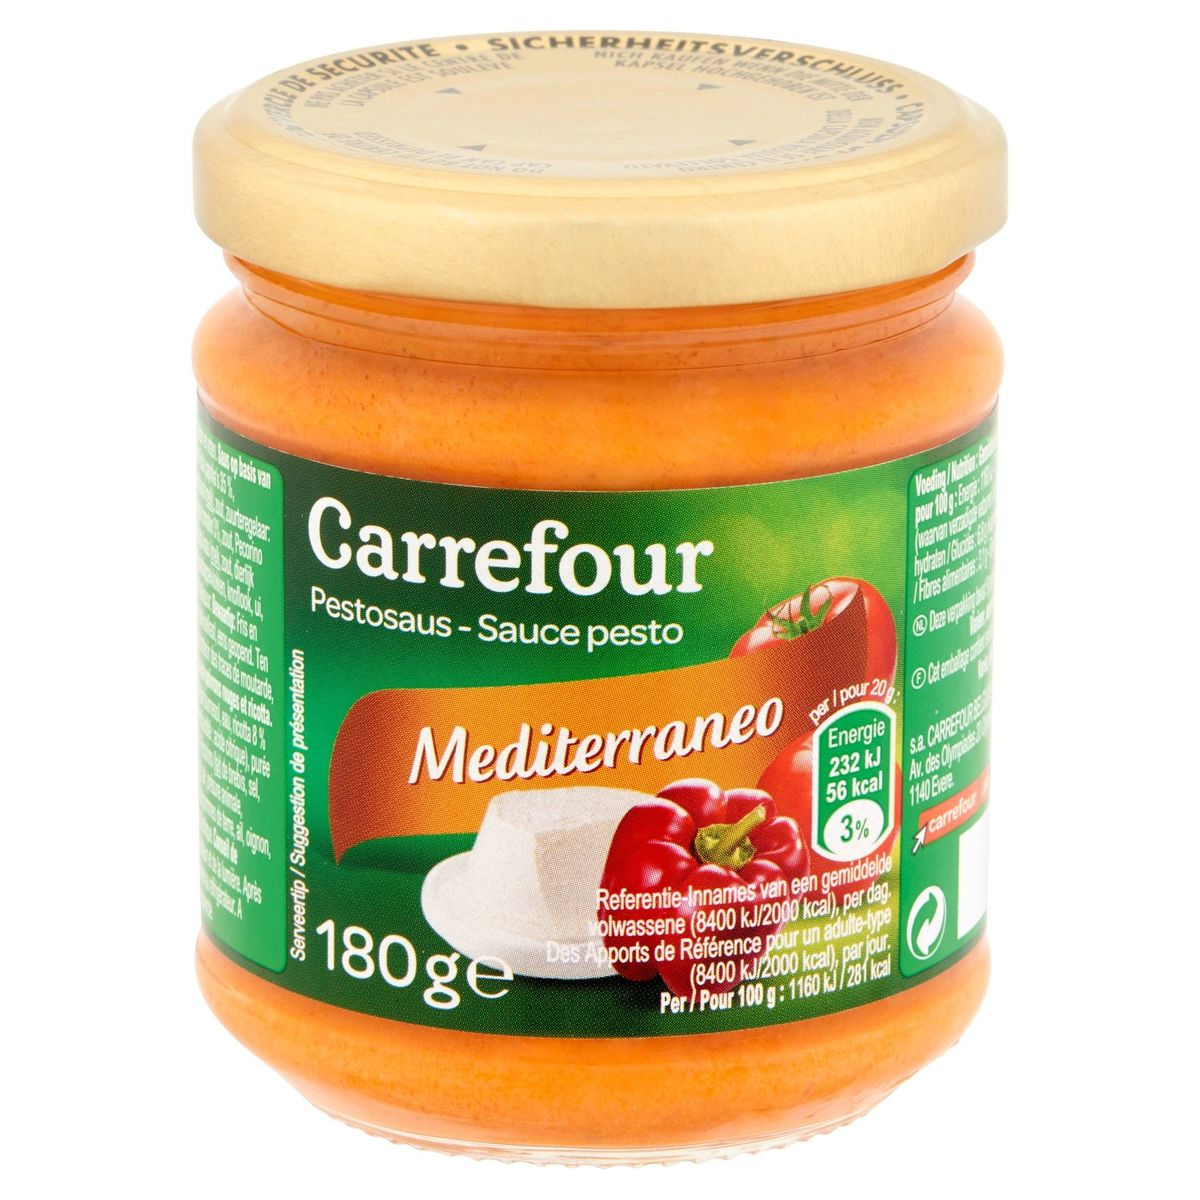 Carrefour Pestosaus Mediterraneo 180 g